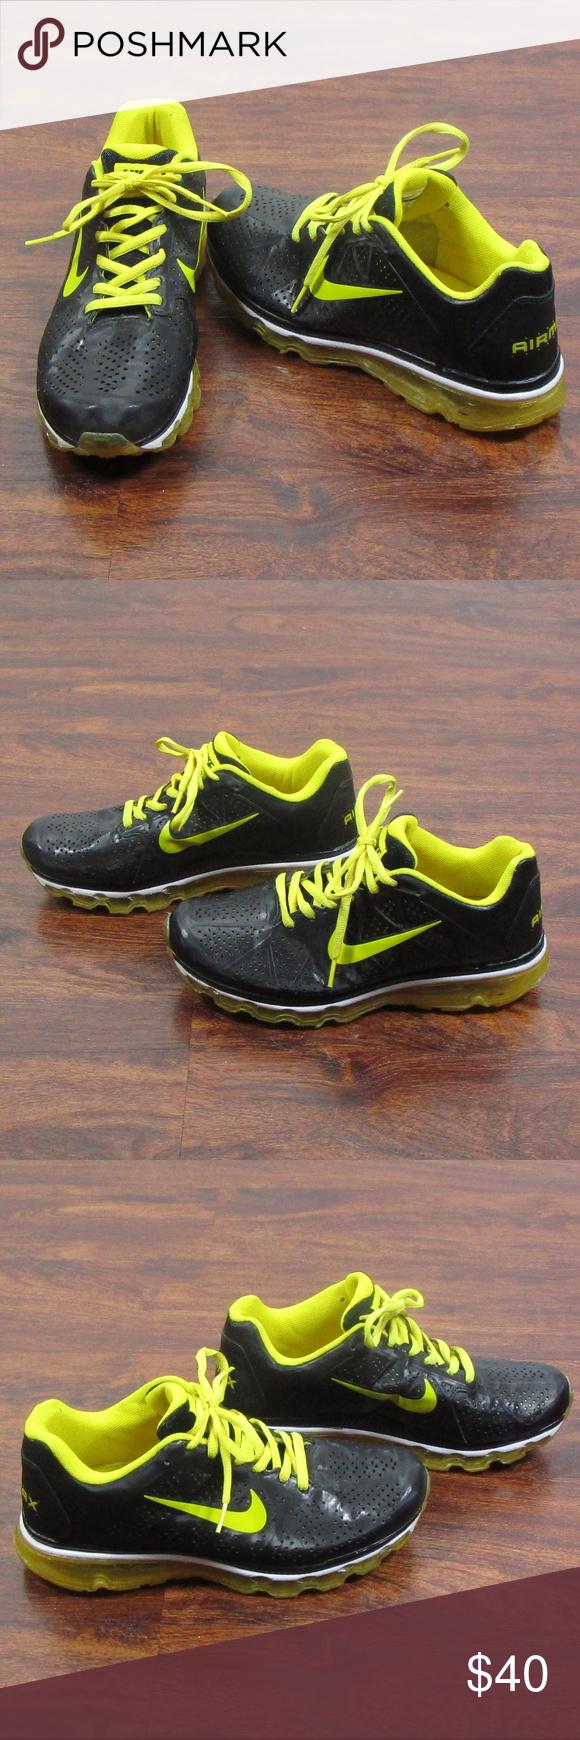 Nike Air Max Leather Black Charm Yellow Swoosh